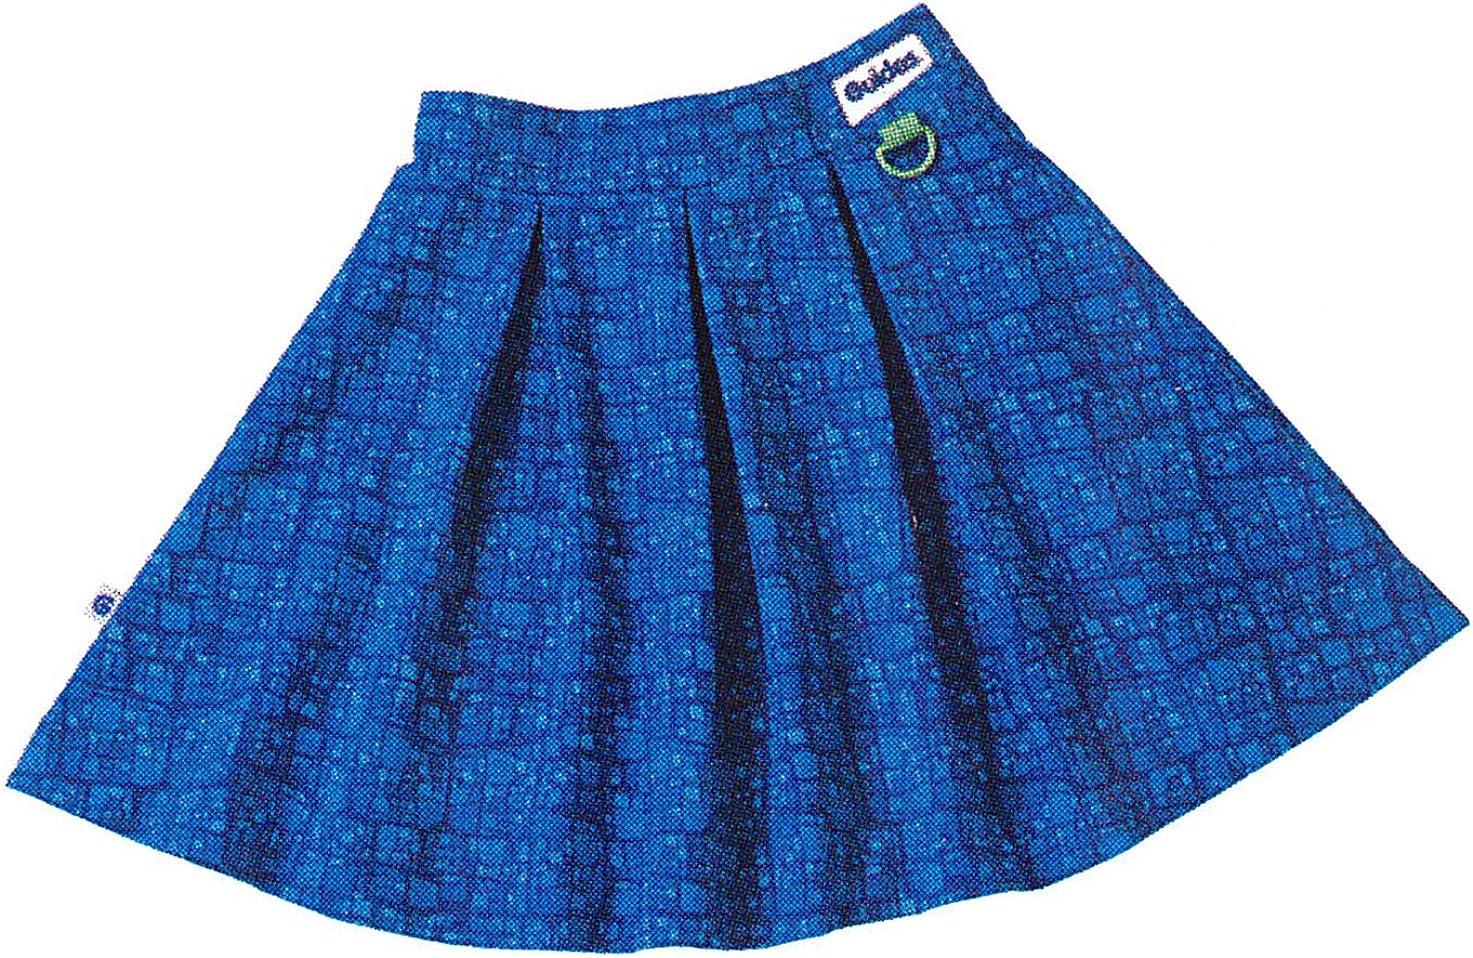 Official Girl Guides Uniform Skirt